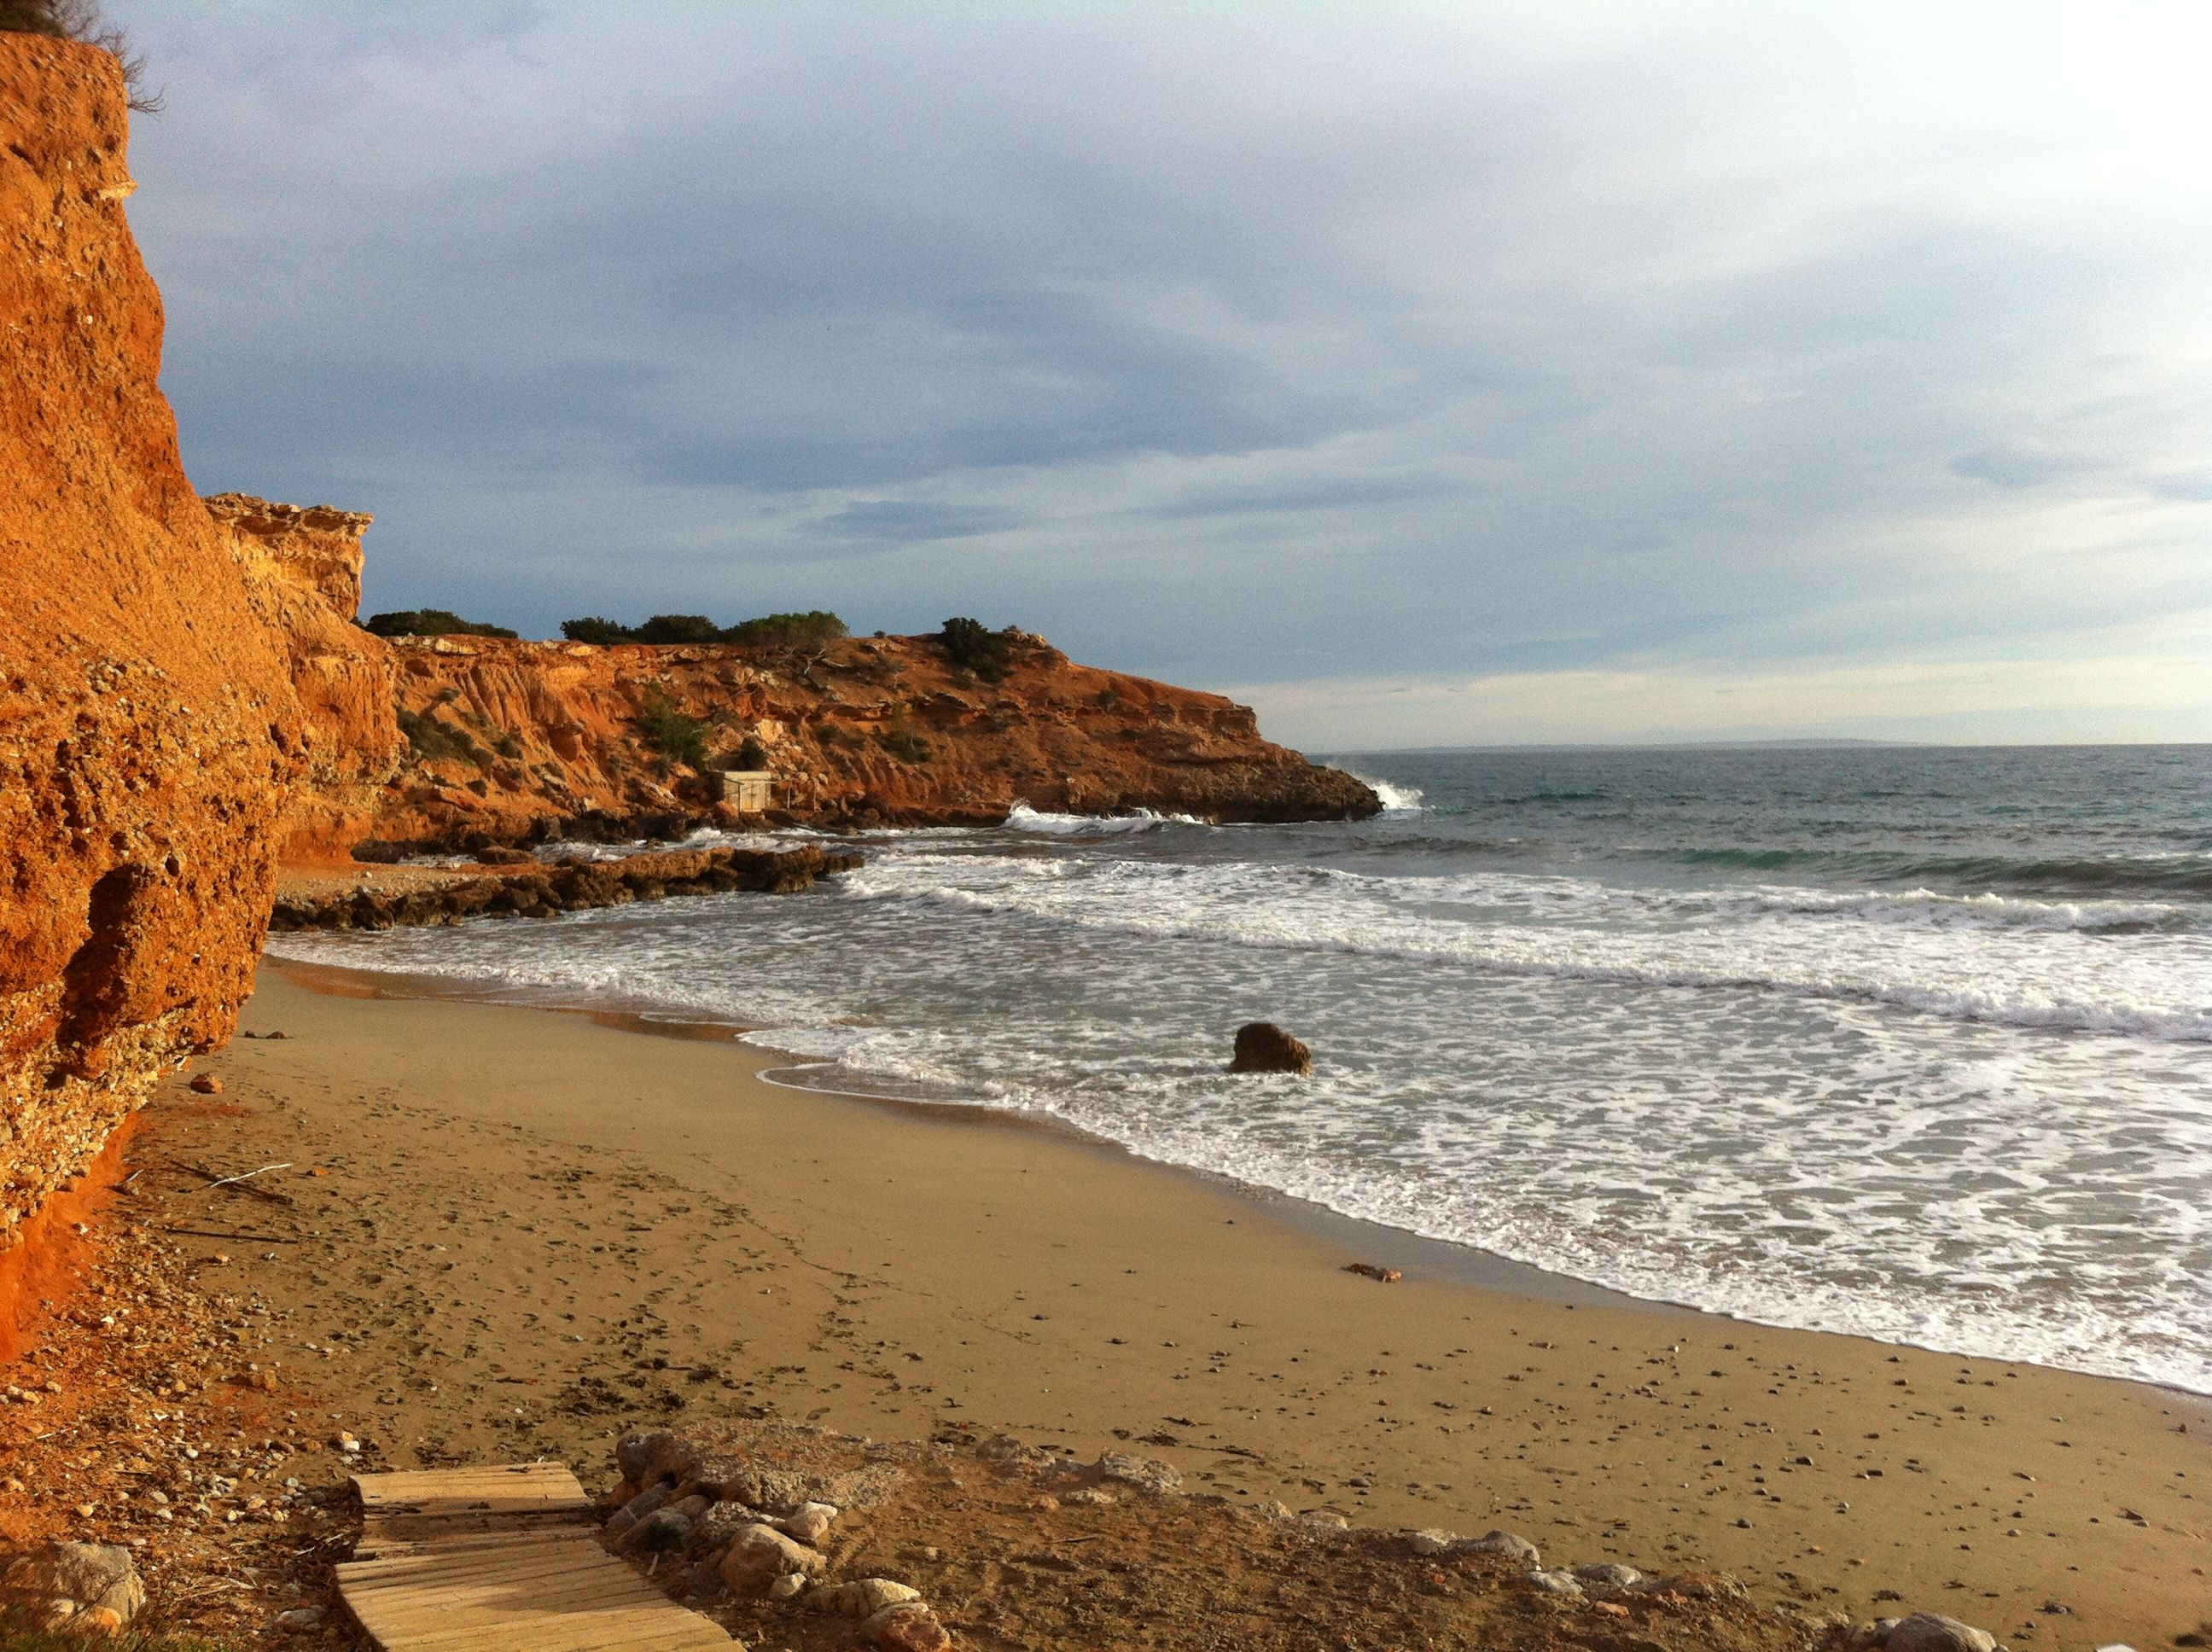 Deserted beaches, Ibiza in the winter #ibiza #villas #winter